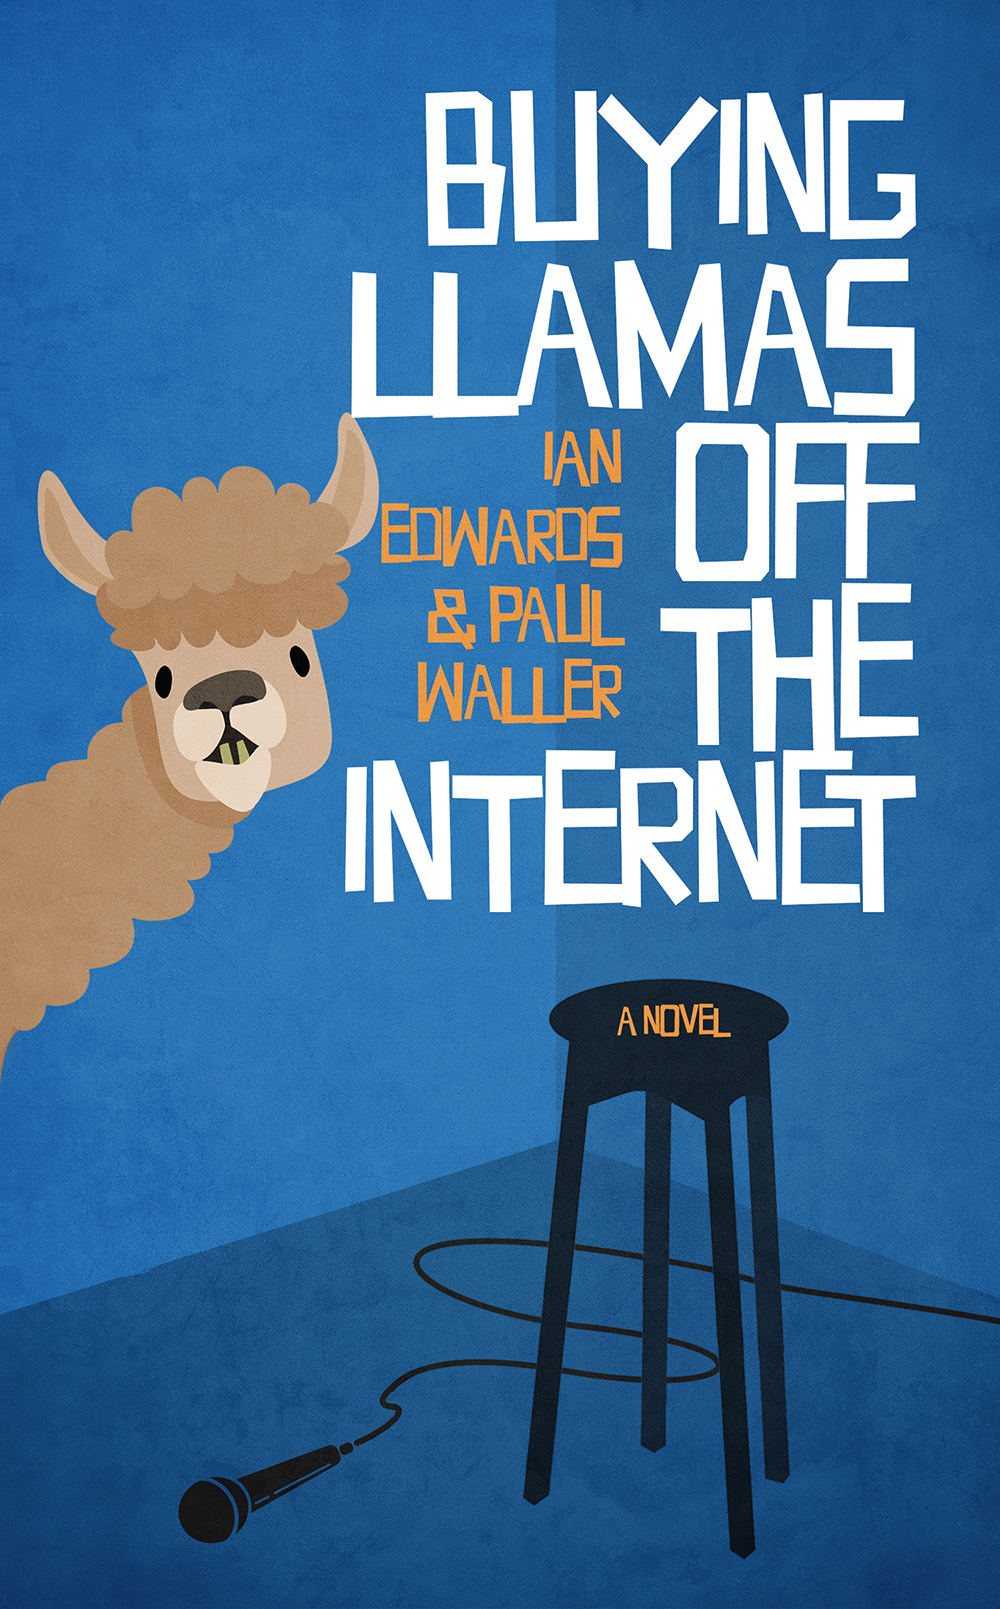 Buying Llamas Off the Internet (Small)